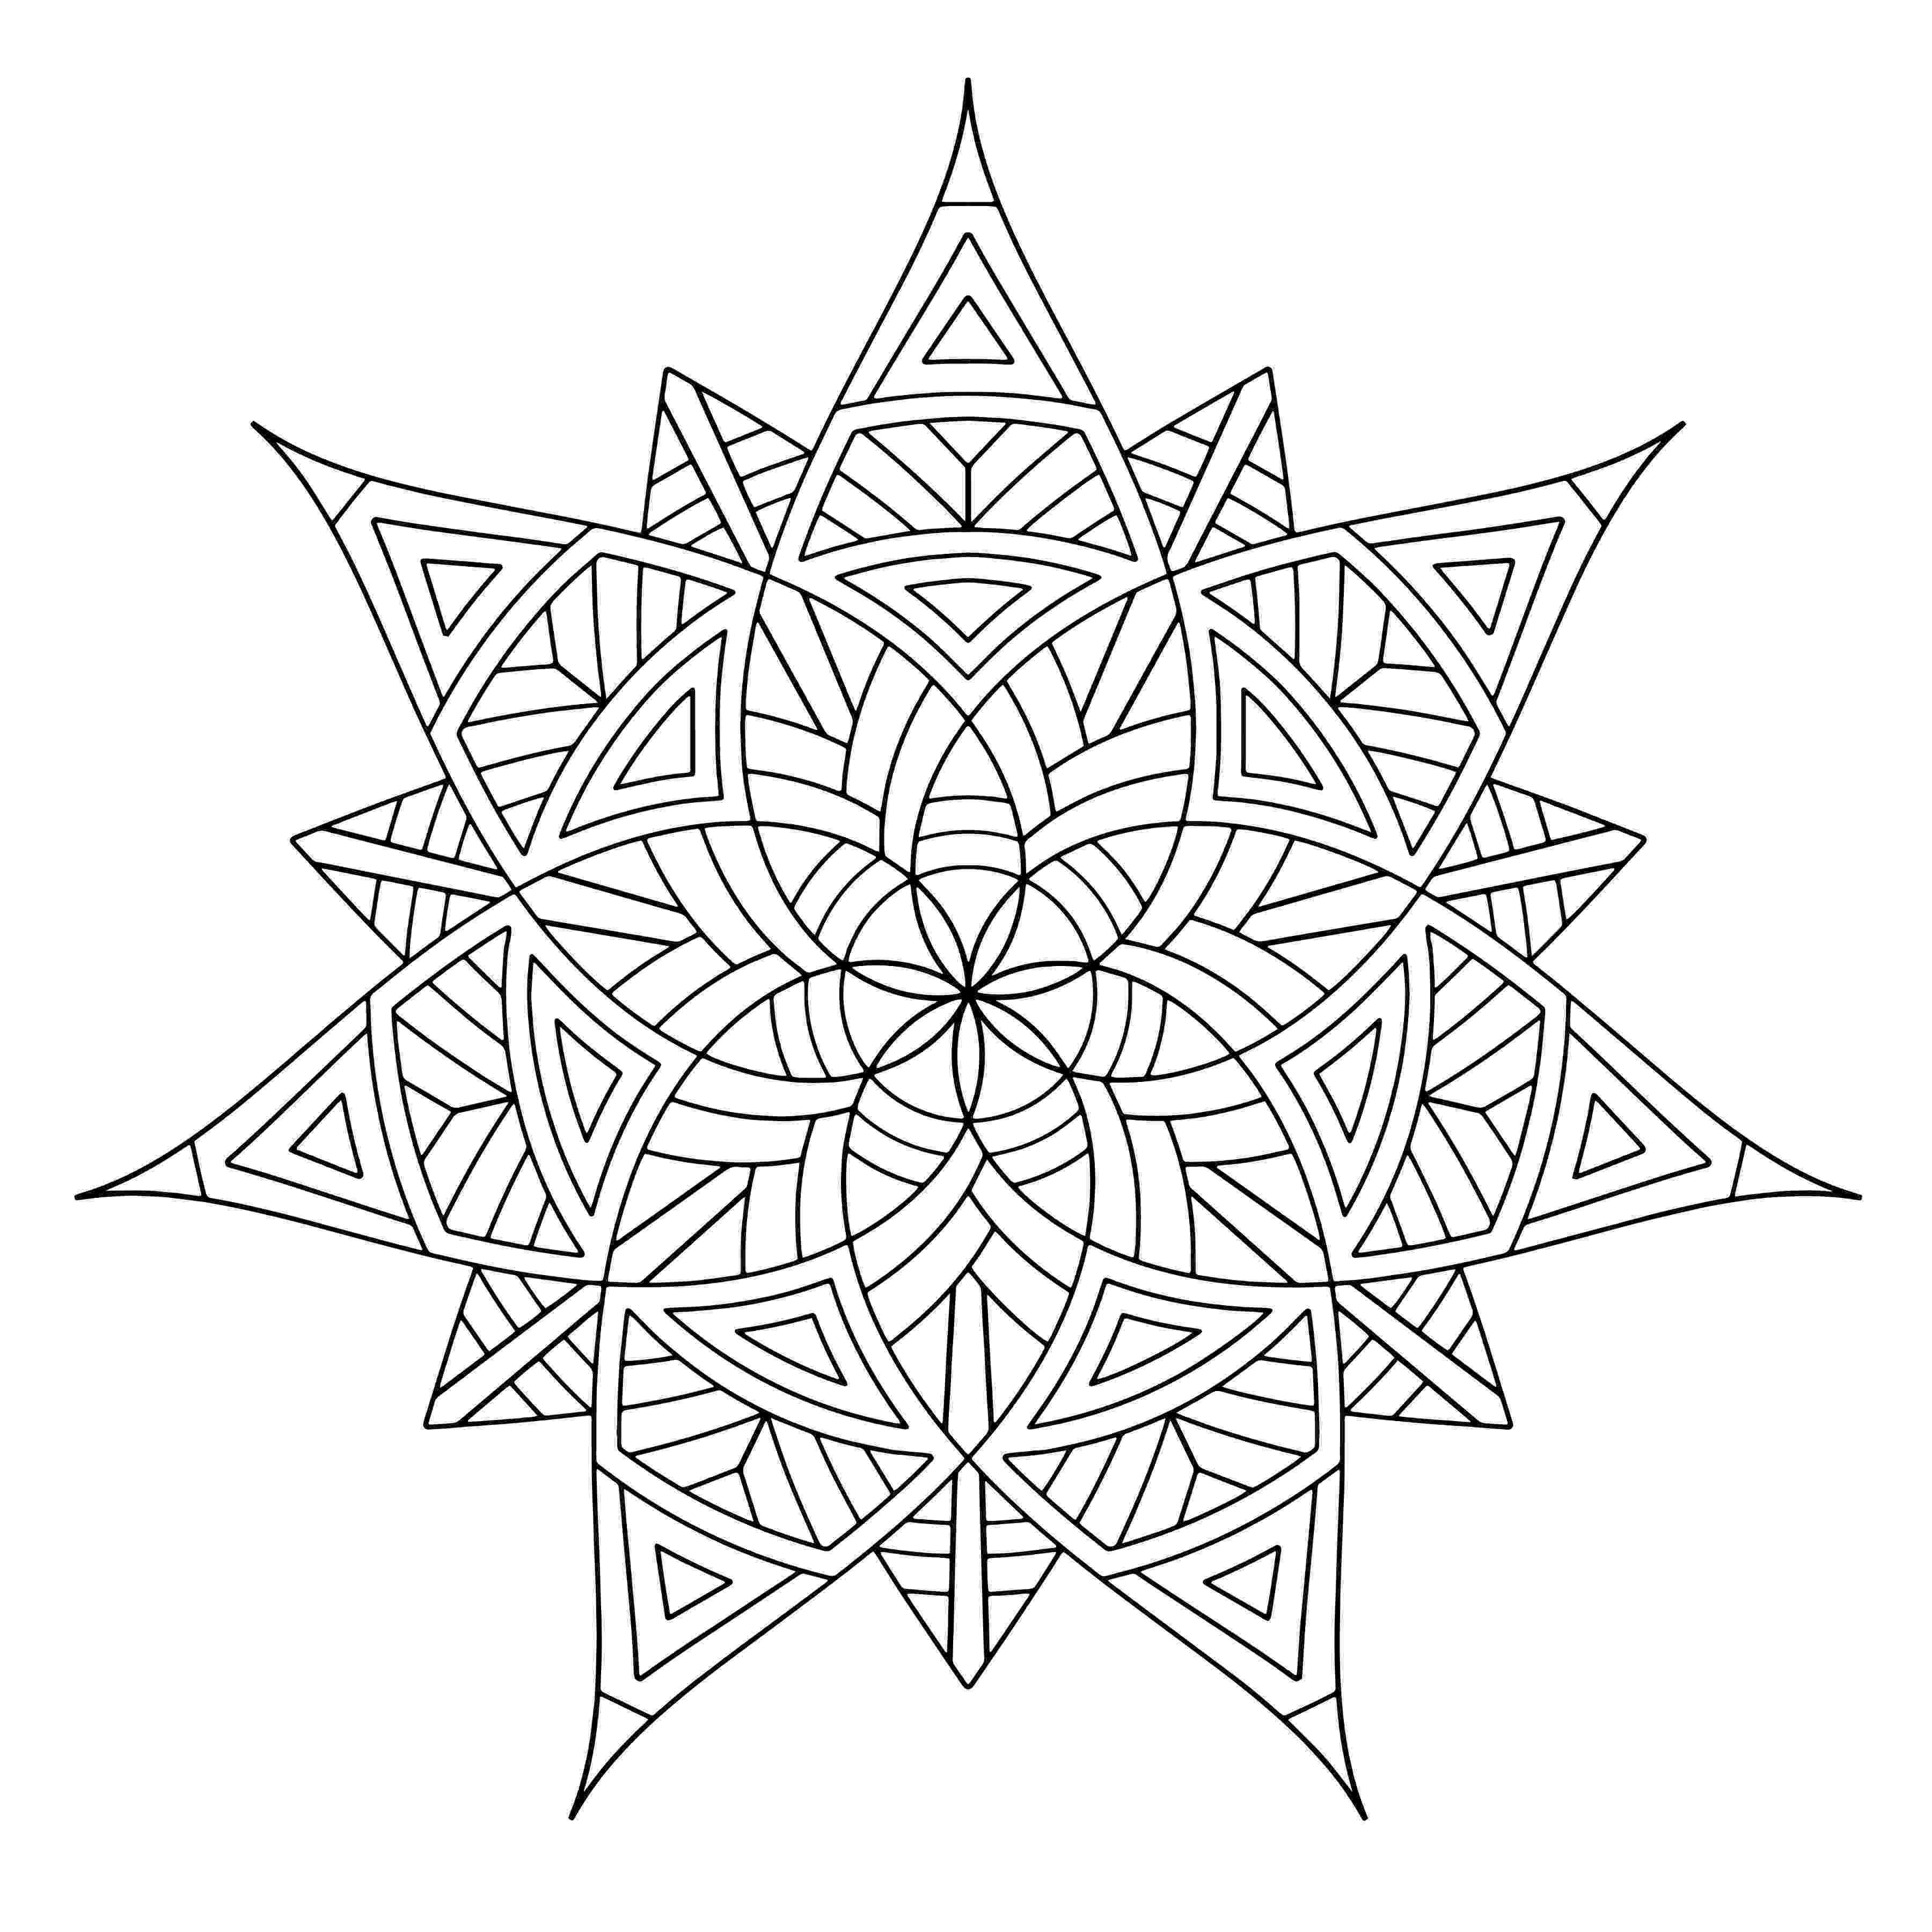 free mandela coloring pages mandala with sun coloring page free printable coloring pages free coloring pages mandela